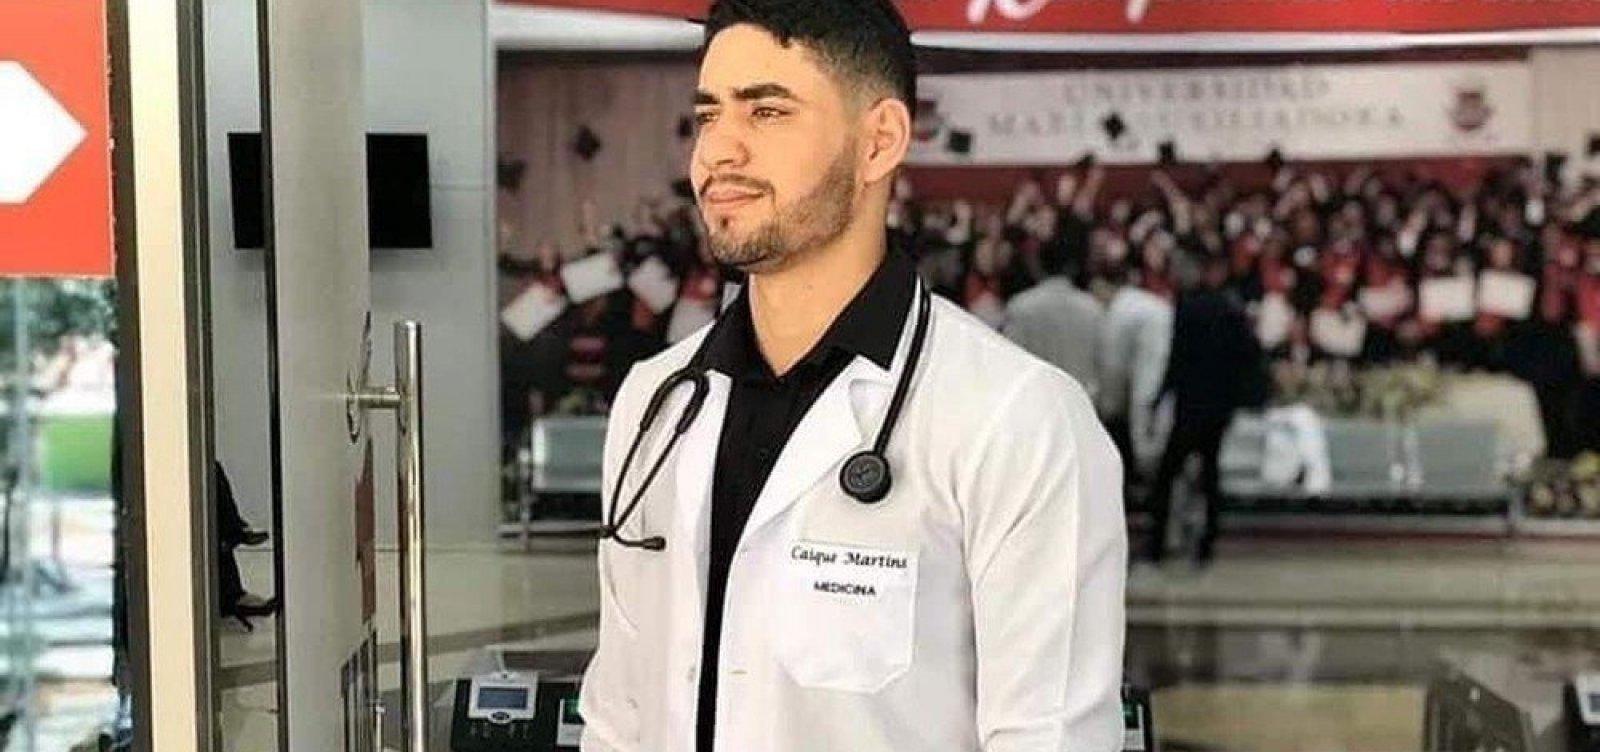 Estudante de medicina de 22 anos é morto a facadas no norte da Bahia; suspeitos fugiram